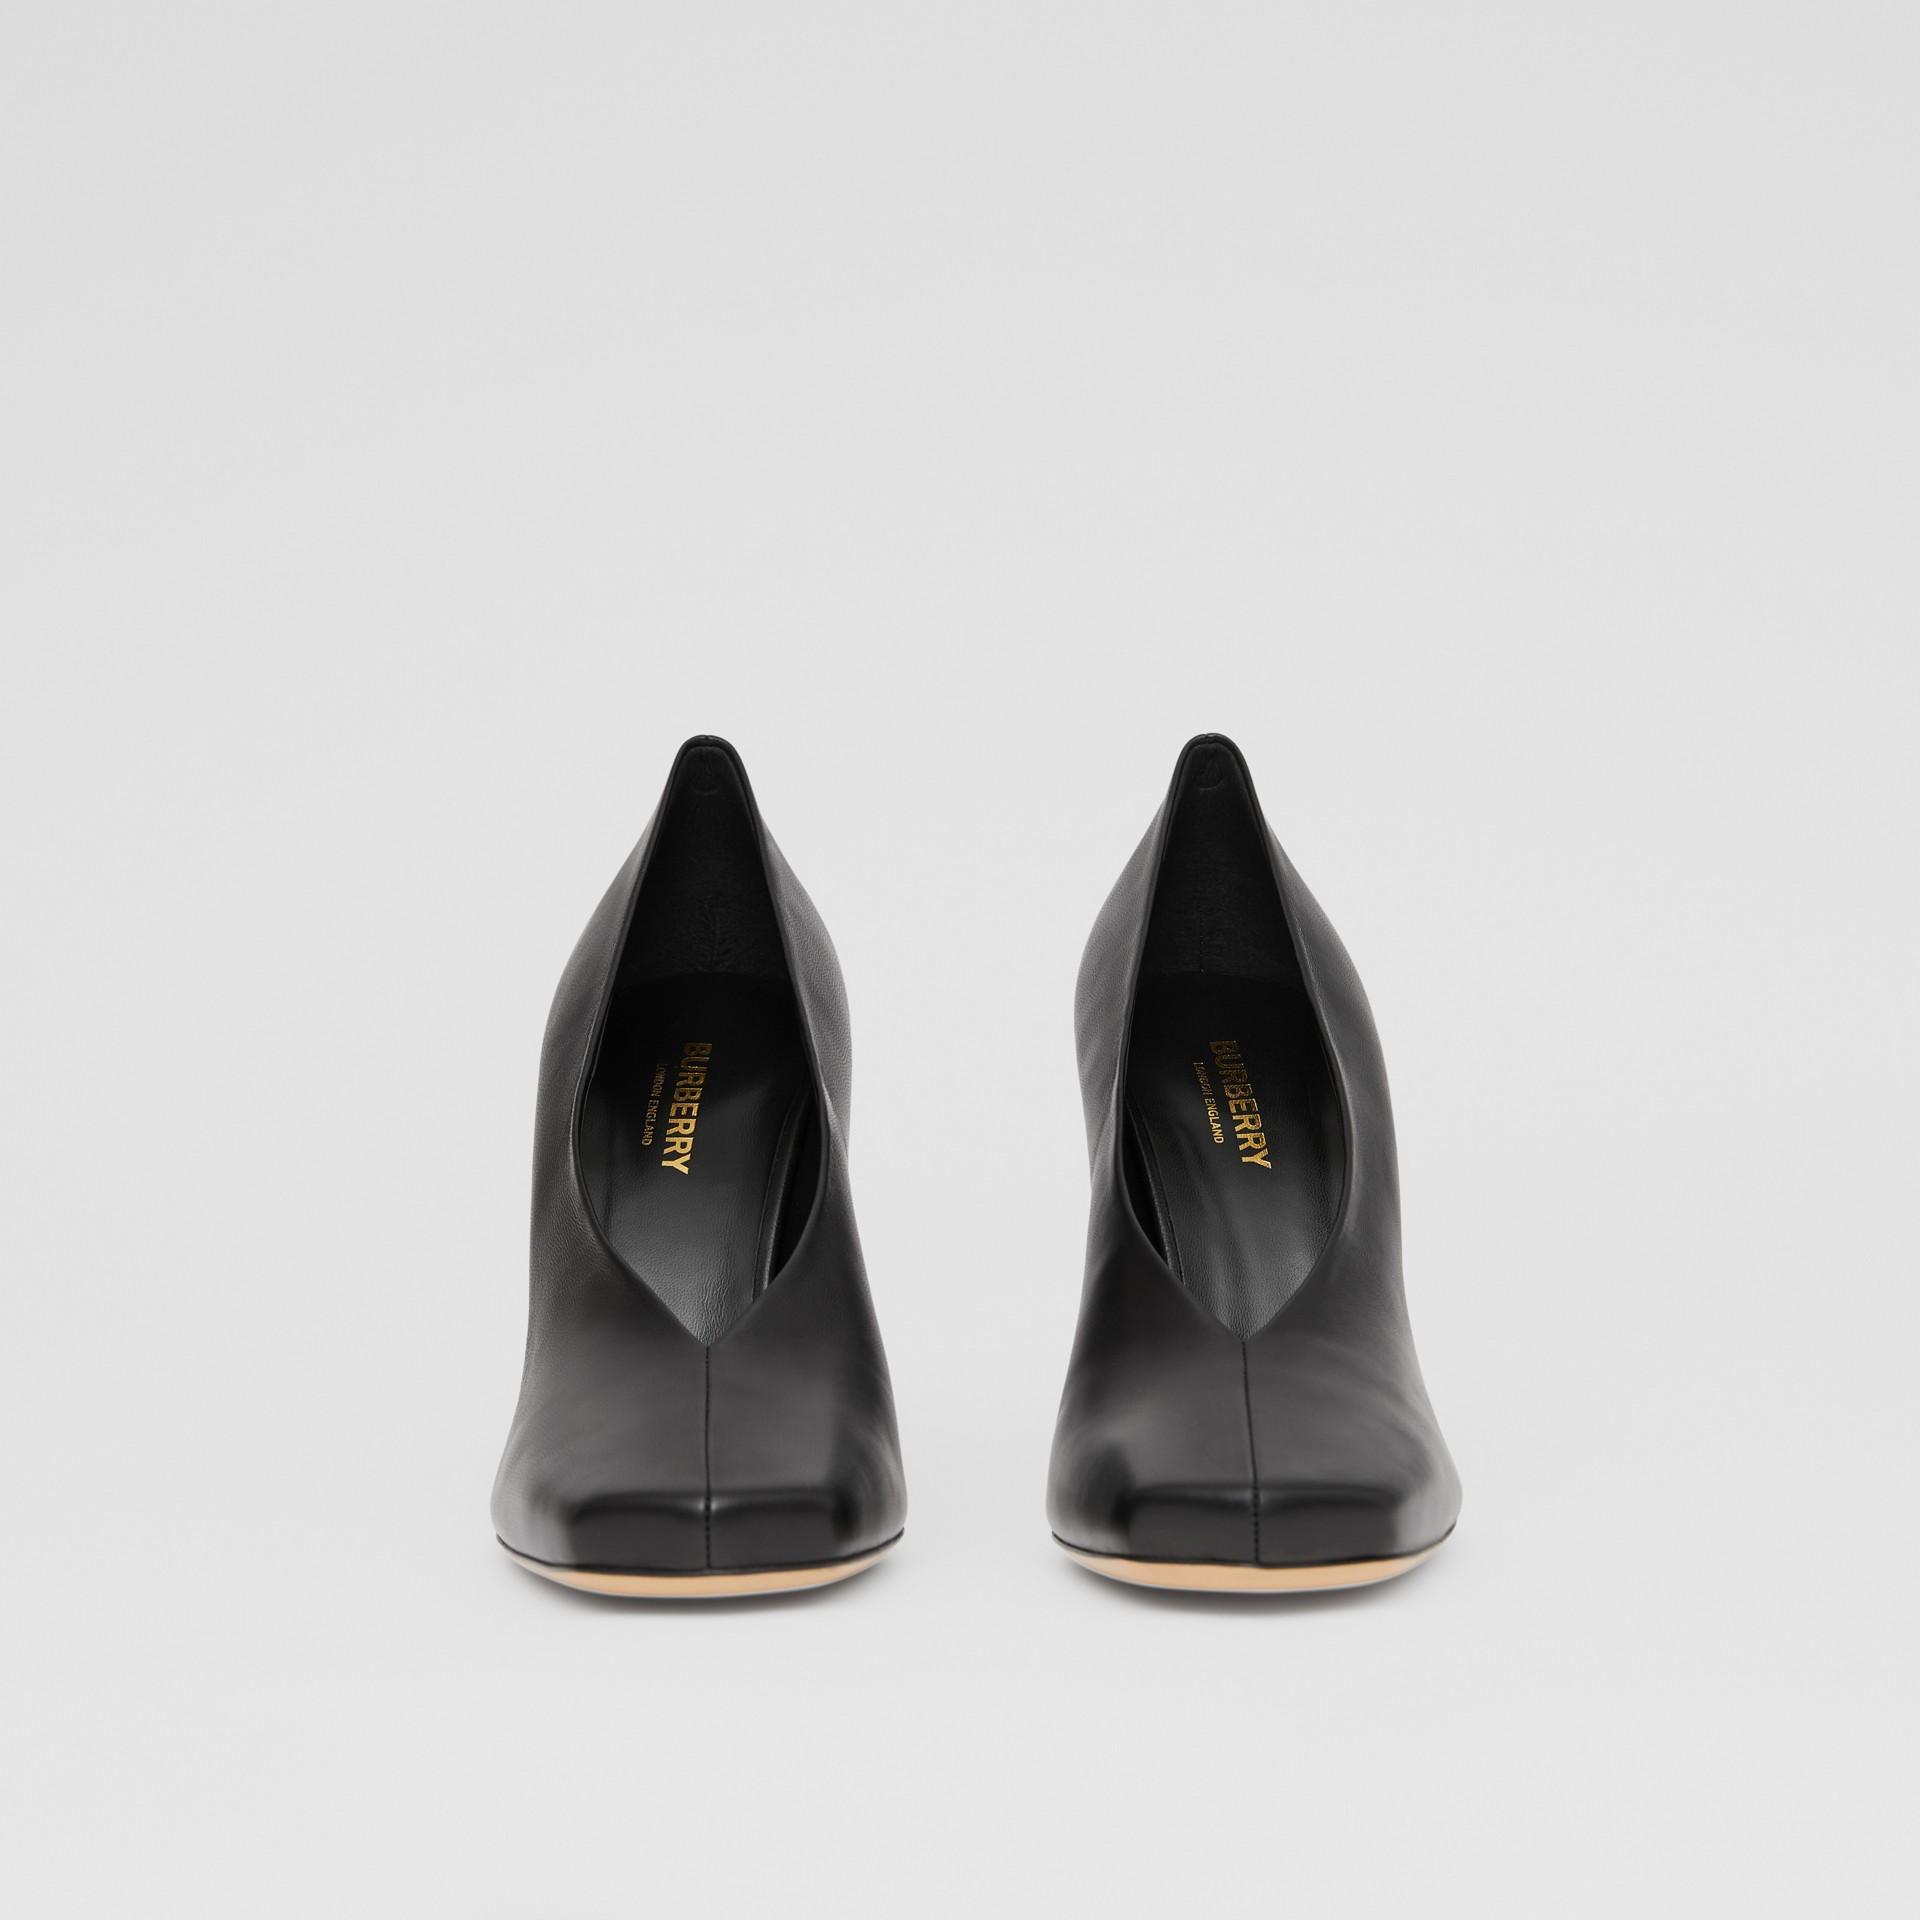 Lambskin Sculptural Pumps in Black - Women | Burberry - gallery image 3